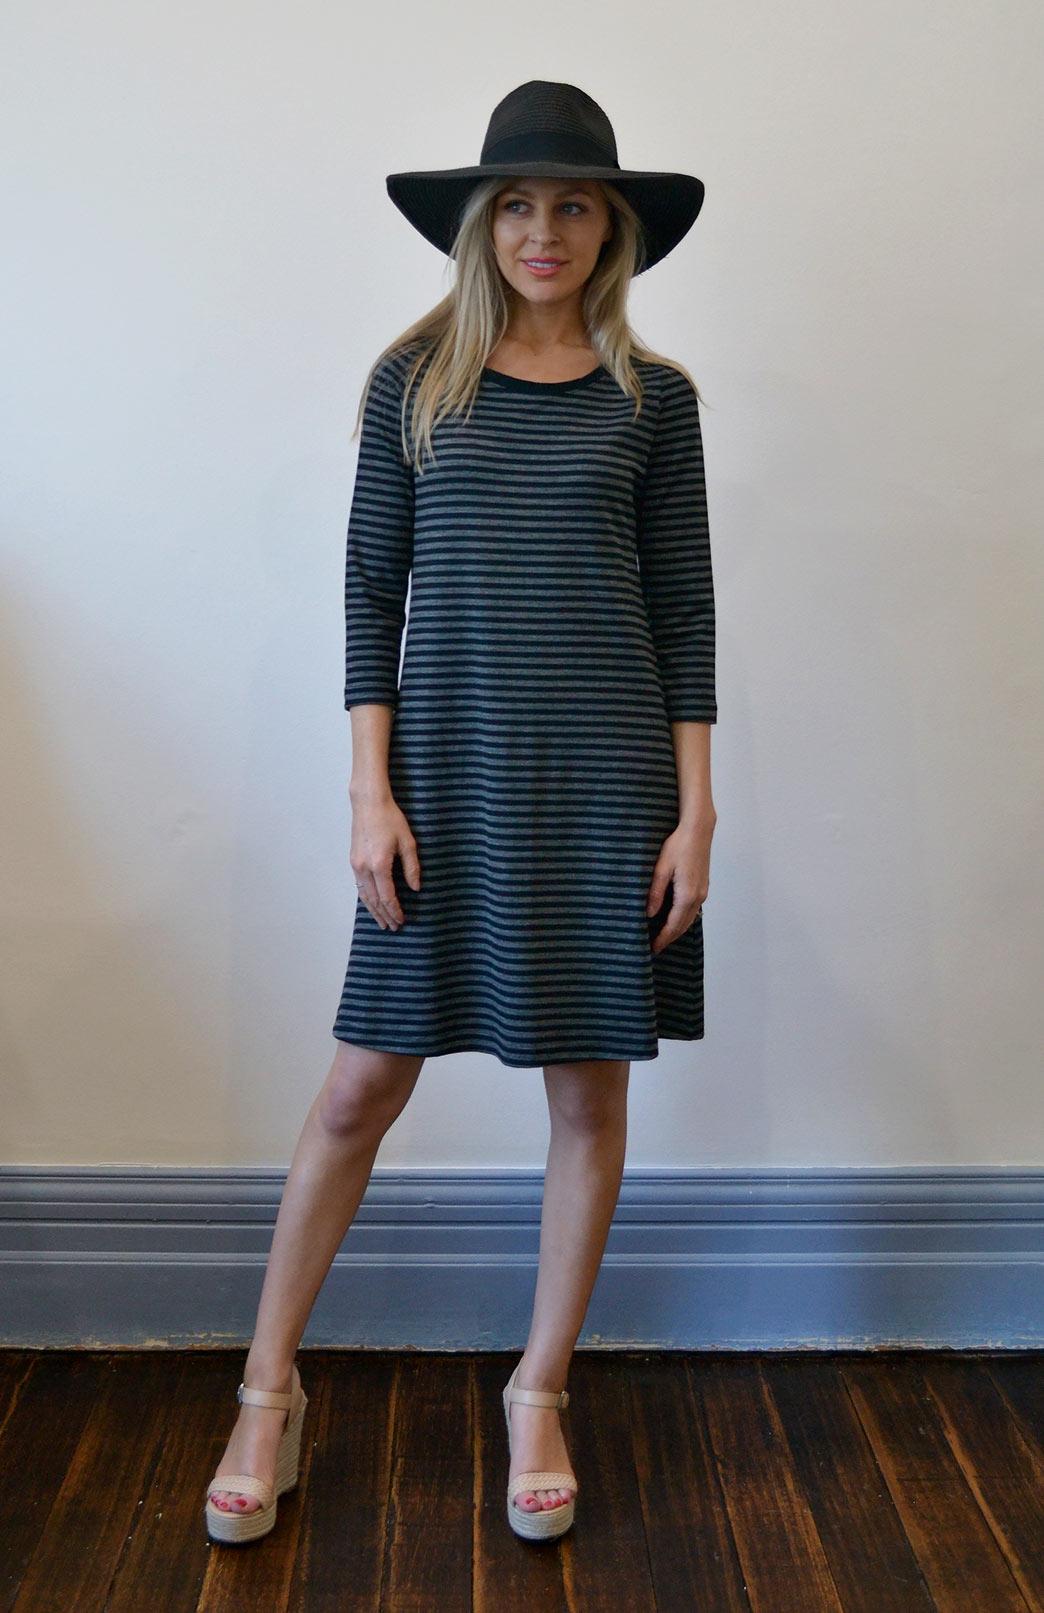 Ellie Swing Dress - Women's Black and Grey Superfine Merino Wool Swing Dress with sleeves and pockets - Smitten Merino Tasmania Australia